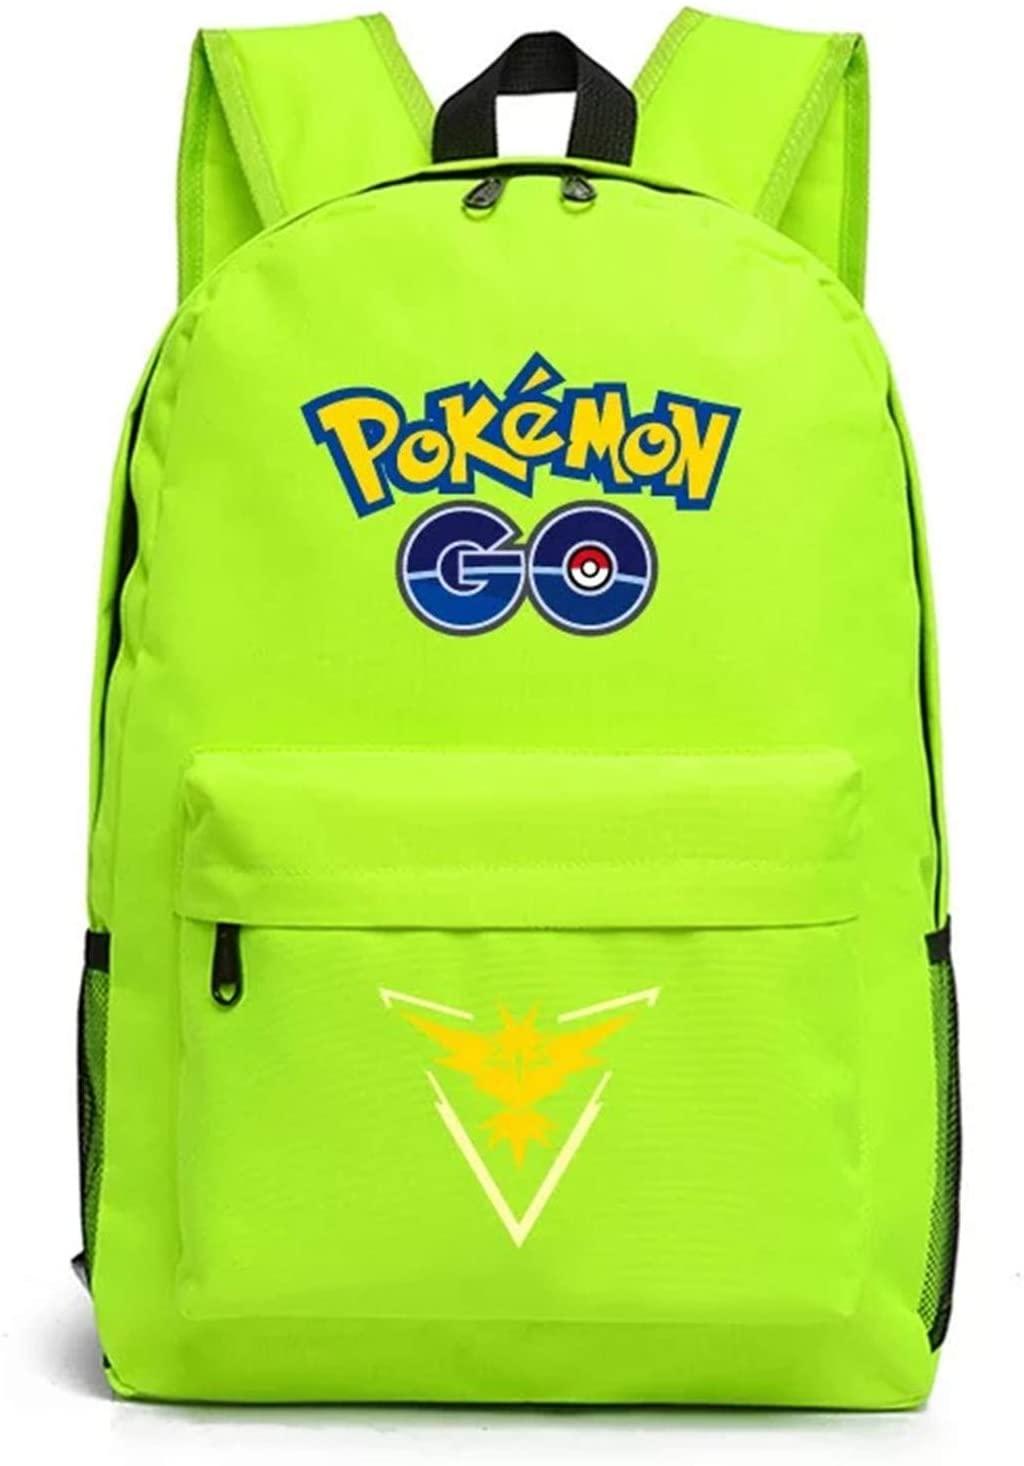 Ku-lee Kids Cartoon Pokemon Backpack-Pokemon Go School Bag Book Bag-Rucksack Backpack for Boys Girls